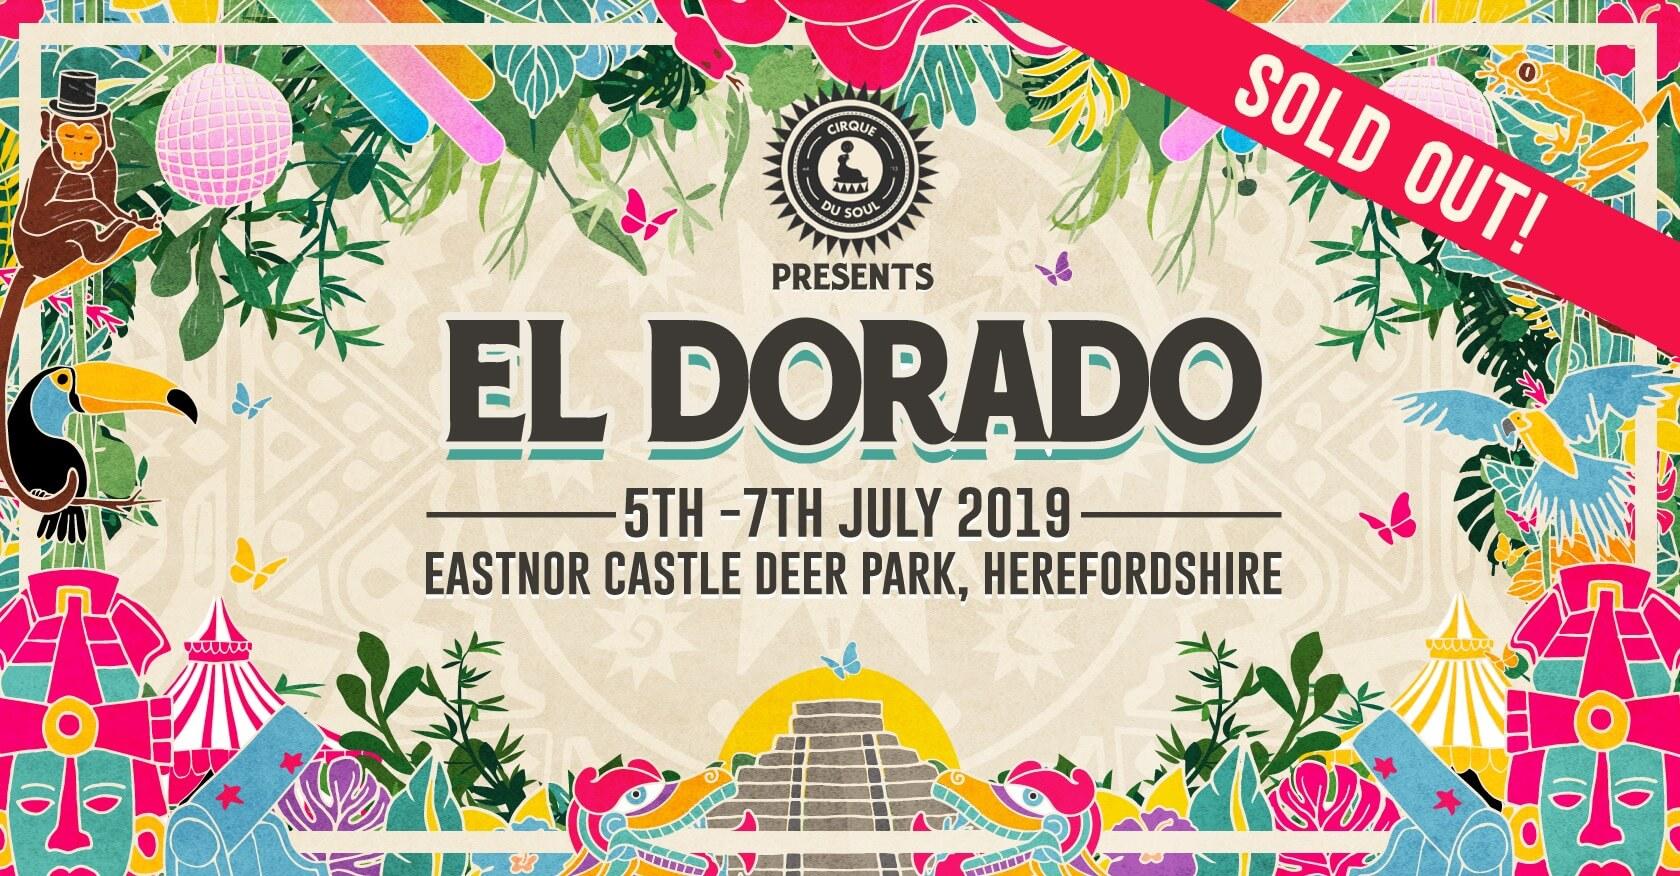 El Dorado festival review banner